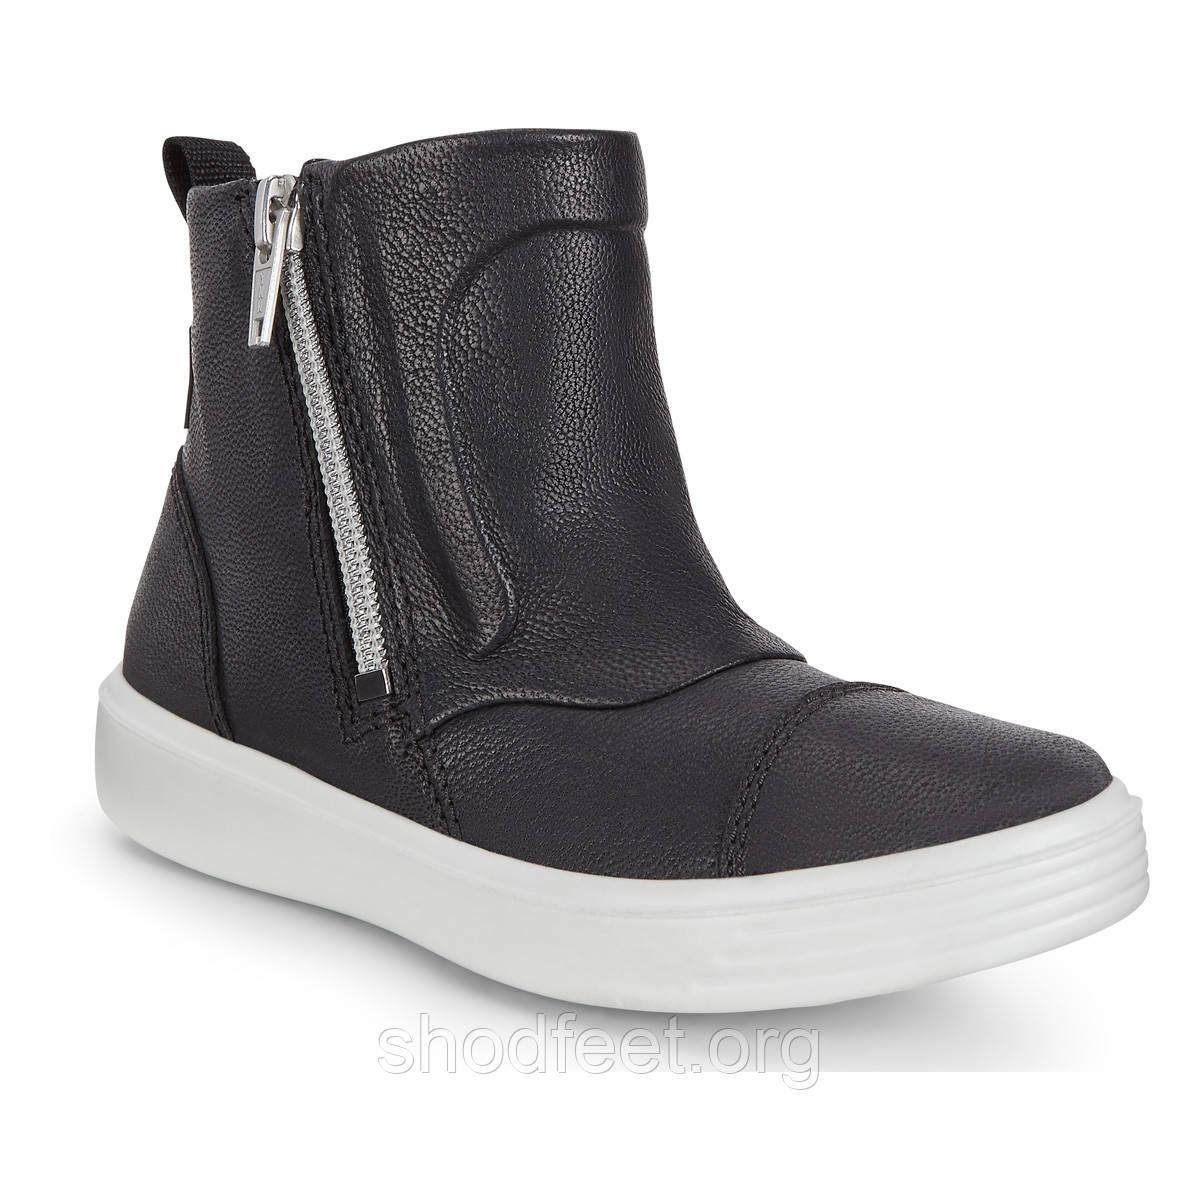 Подростковые ботинки Ecco S7 Teen Gore-Tex 780303-01001